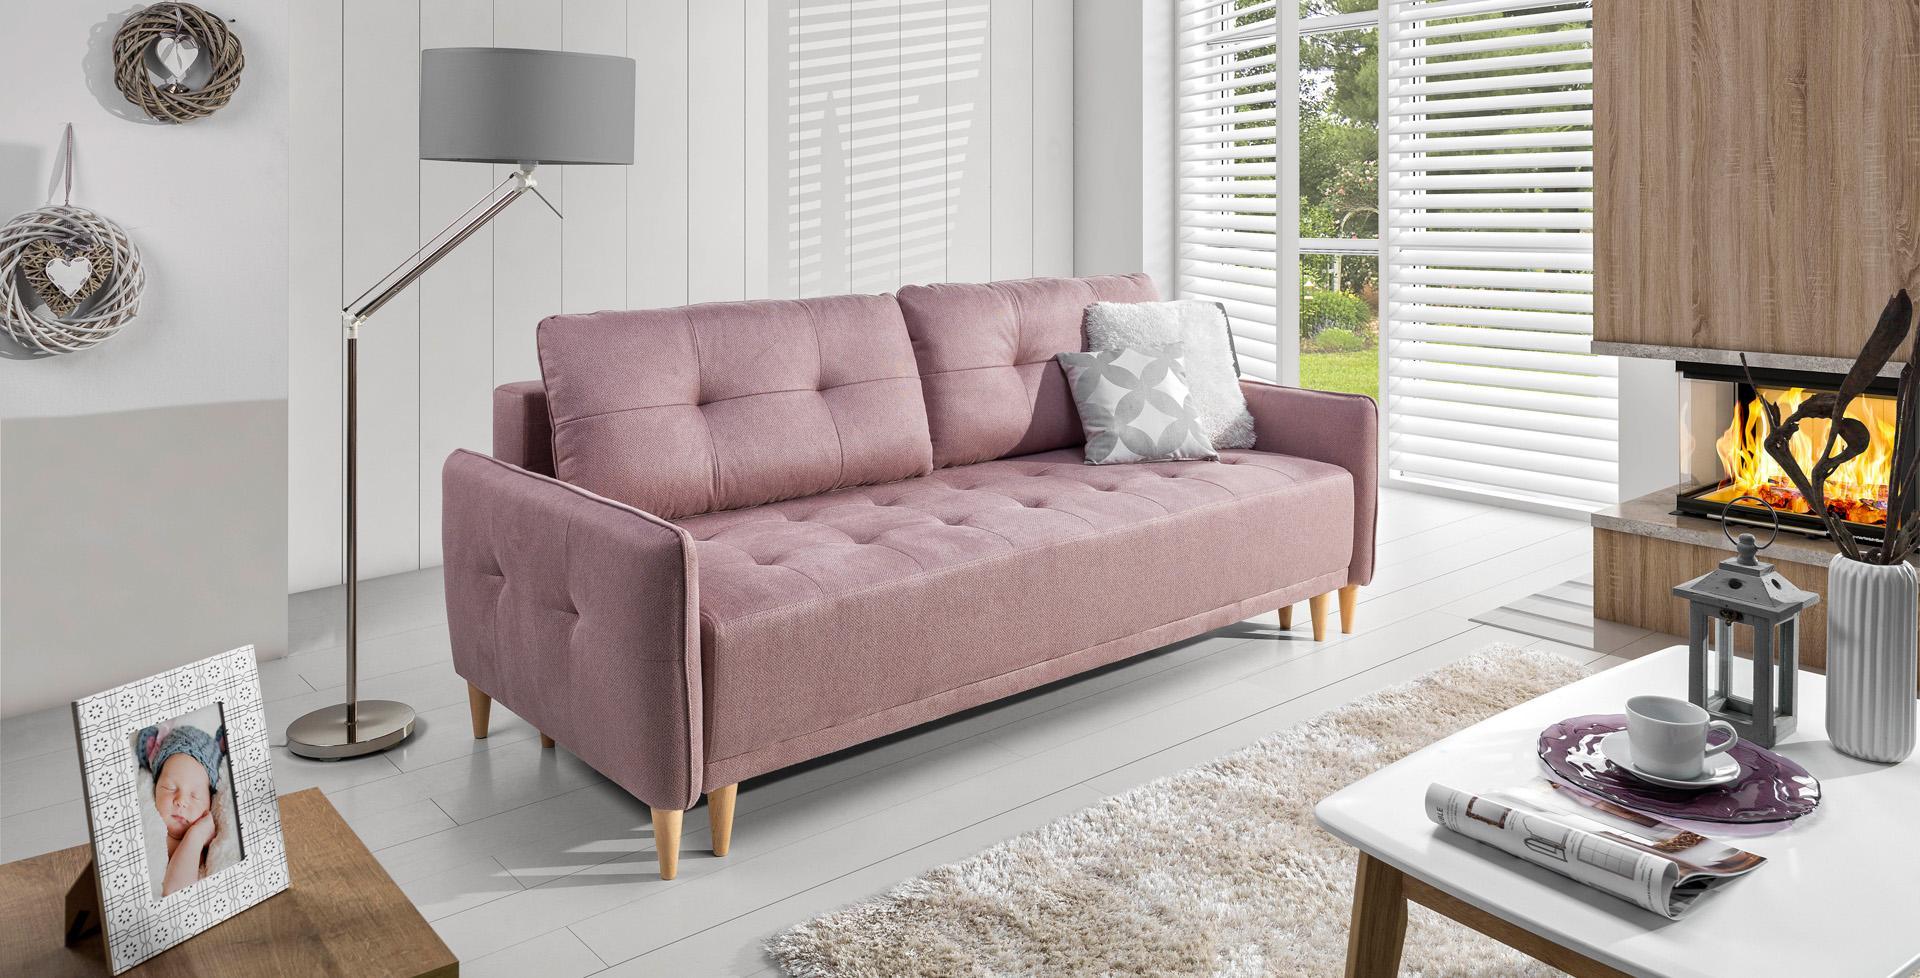 sofa schlafsofa designer 3 sitzer sofa mit bettfunktion bettkasten couch neu malmo www. Black Bedroom Furniture Sets. Home Design Ideas